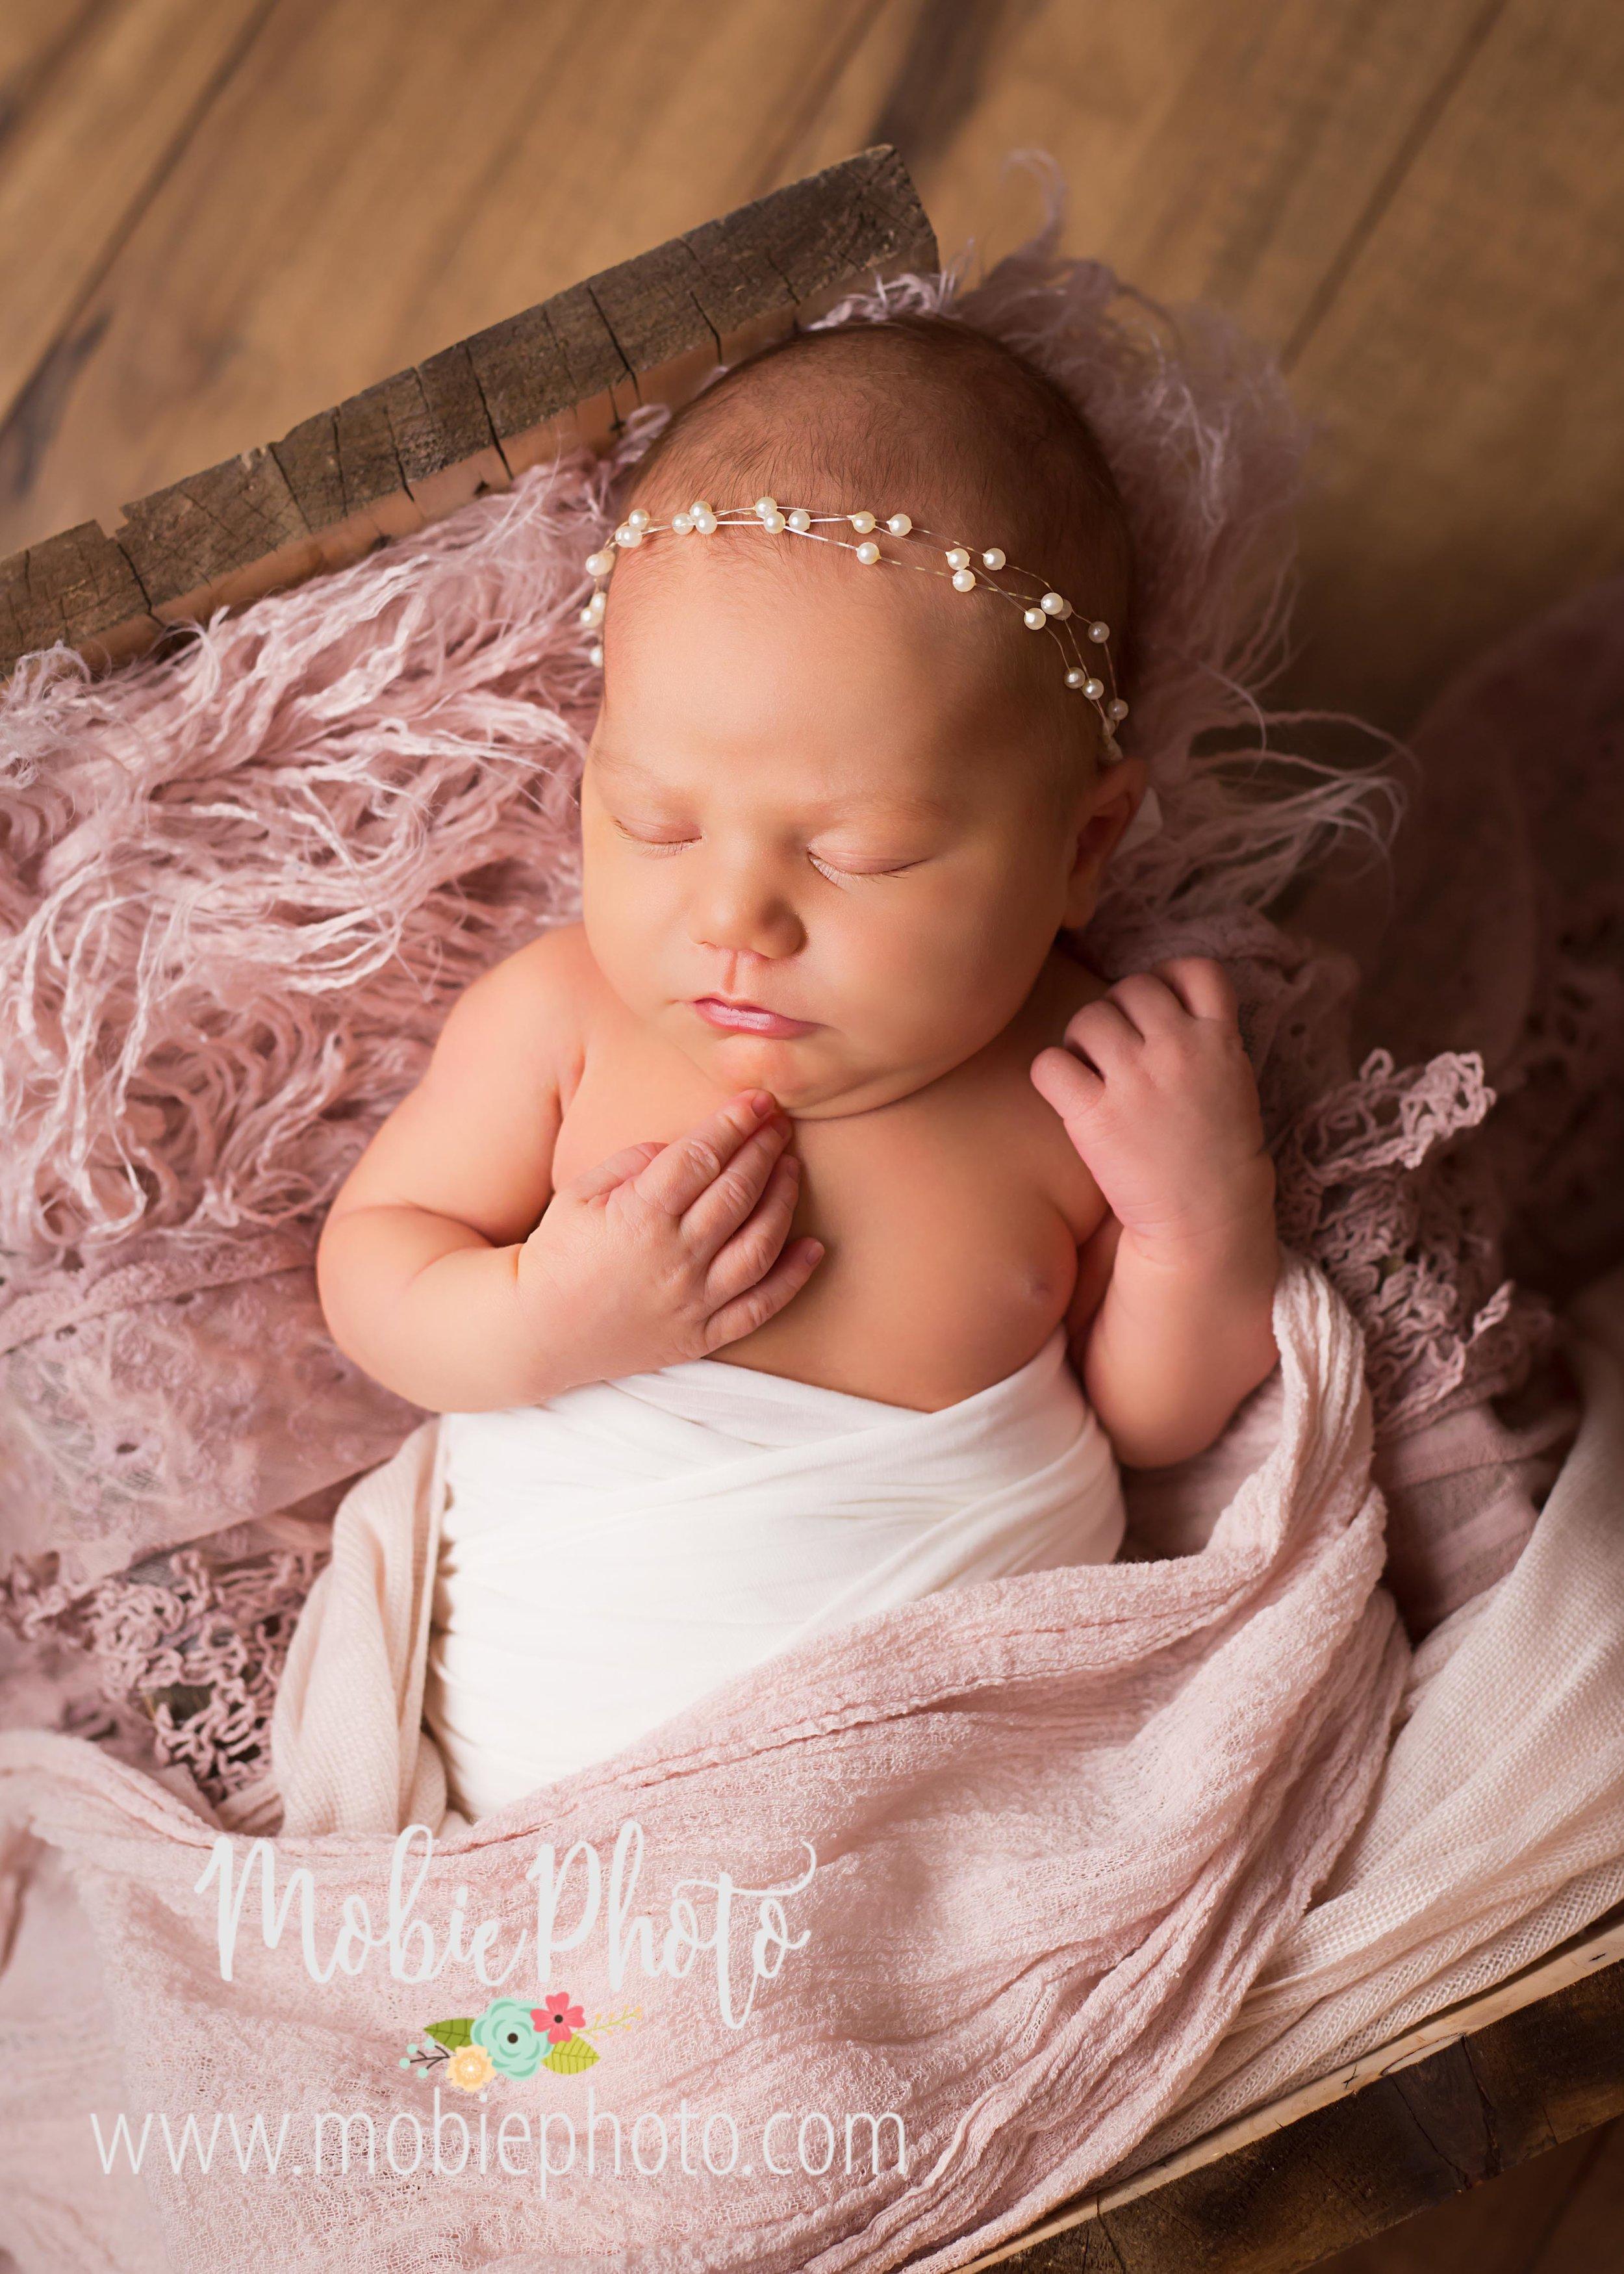 Utah Newborn Photographer - Full Session - Mobie Photo